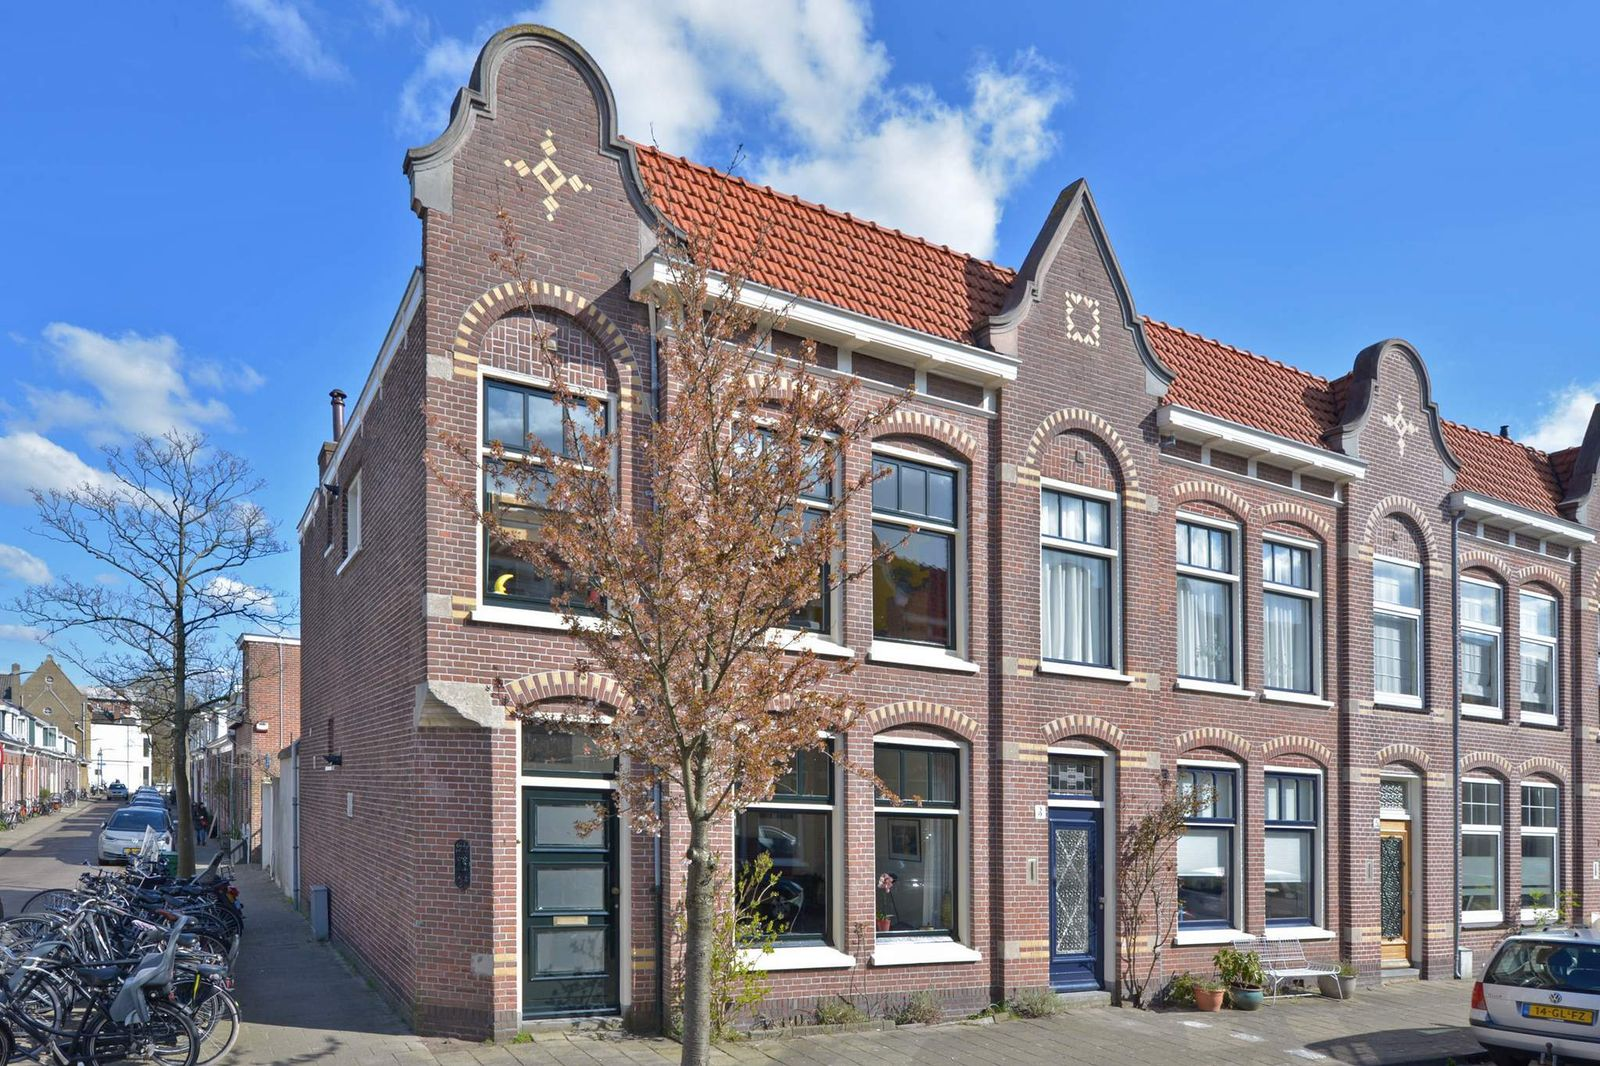 Goltziusstraat 1, Haarlem